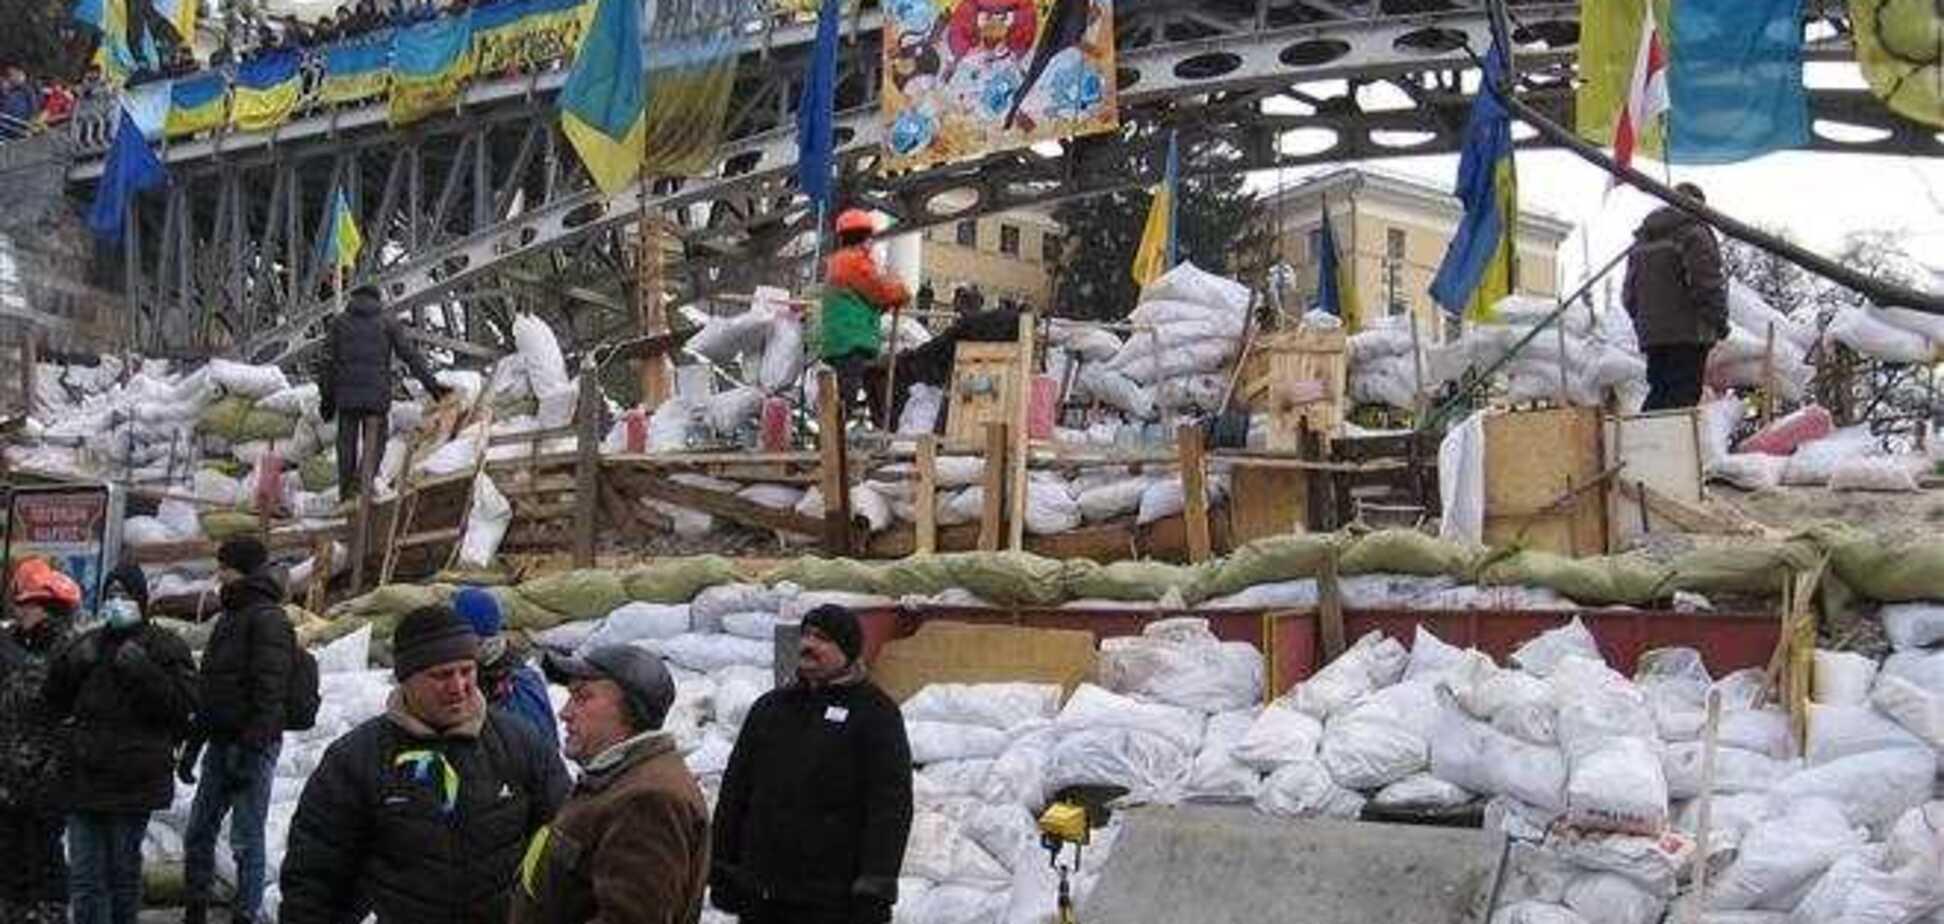 Евромайдан собрал около 18 тысяч митингующих - МВД